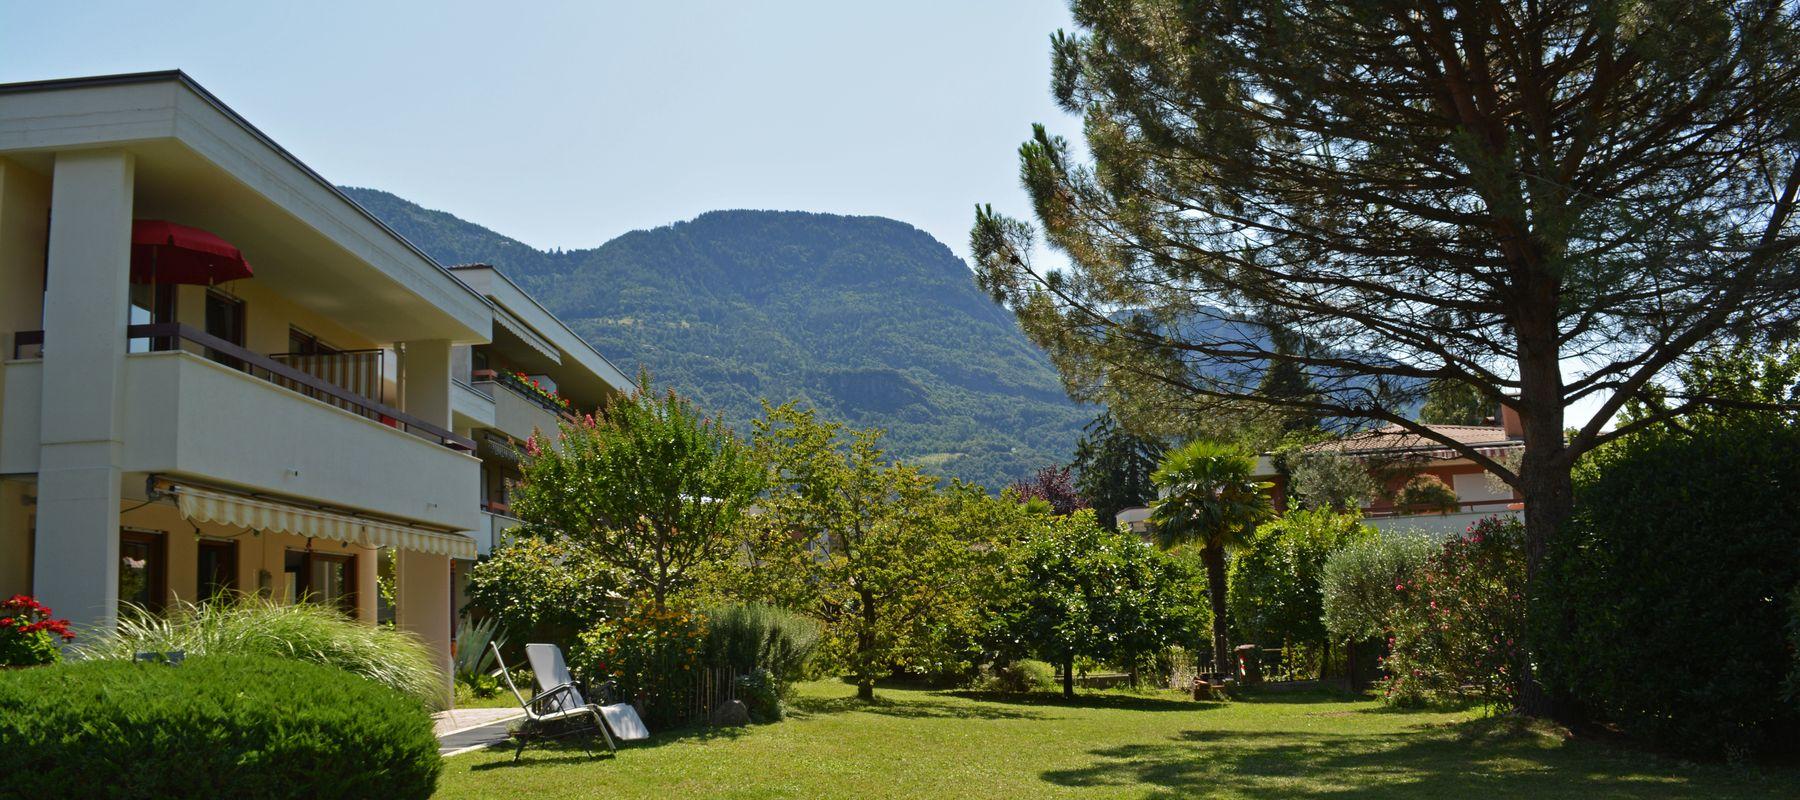 Girardino Maia Bassa Alto Adige